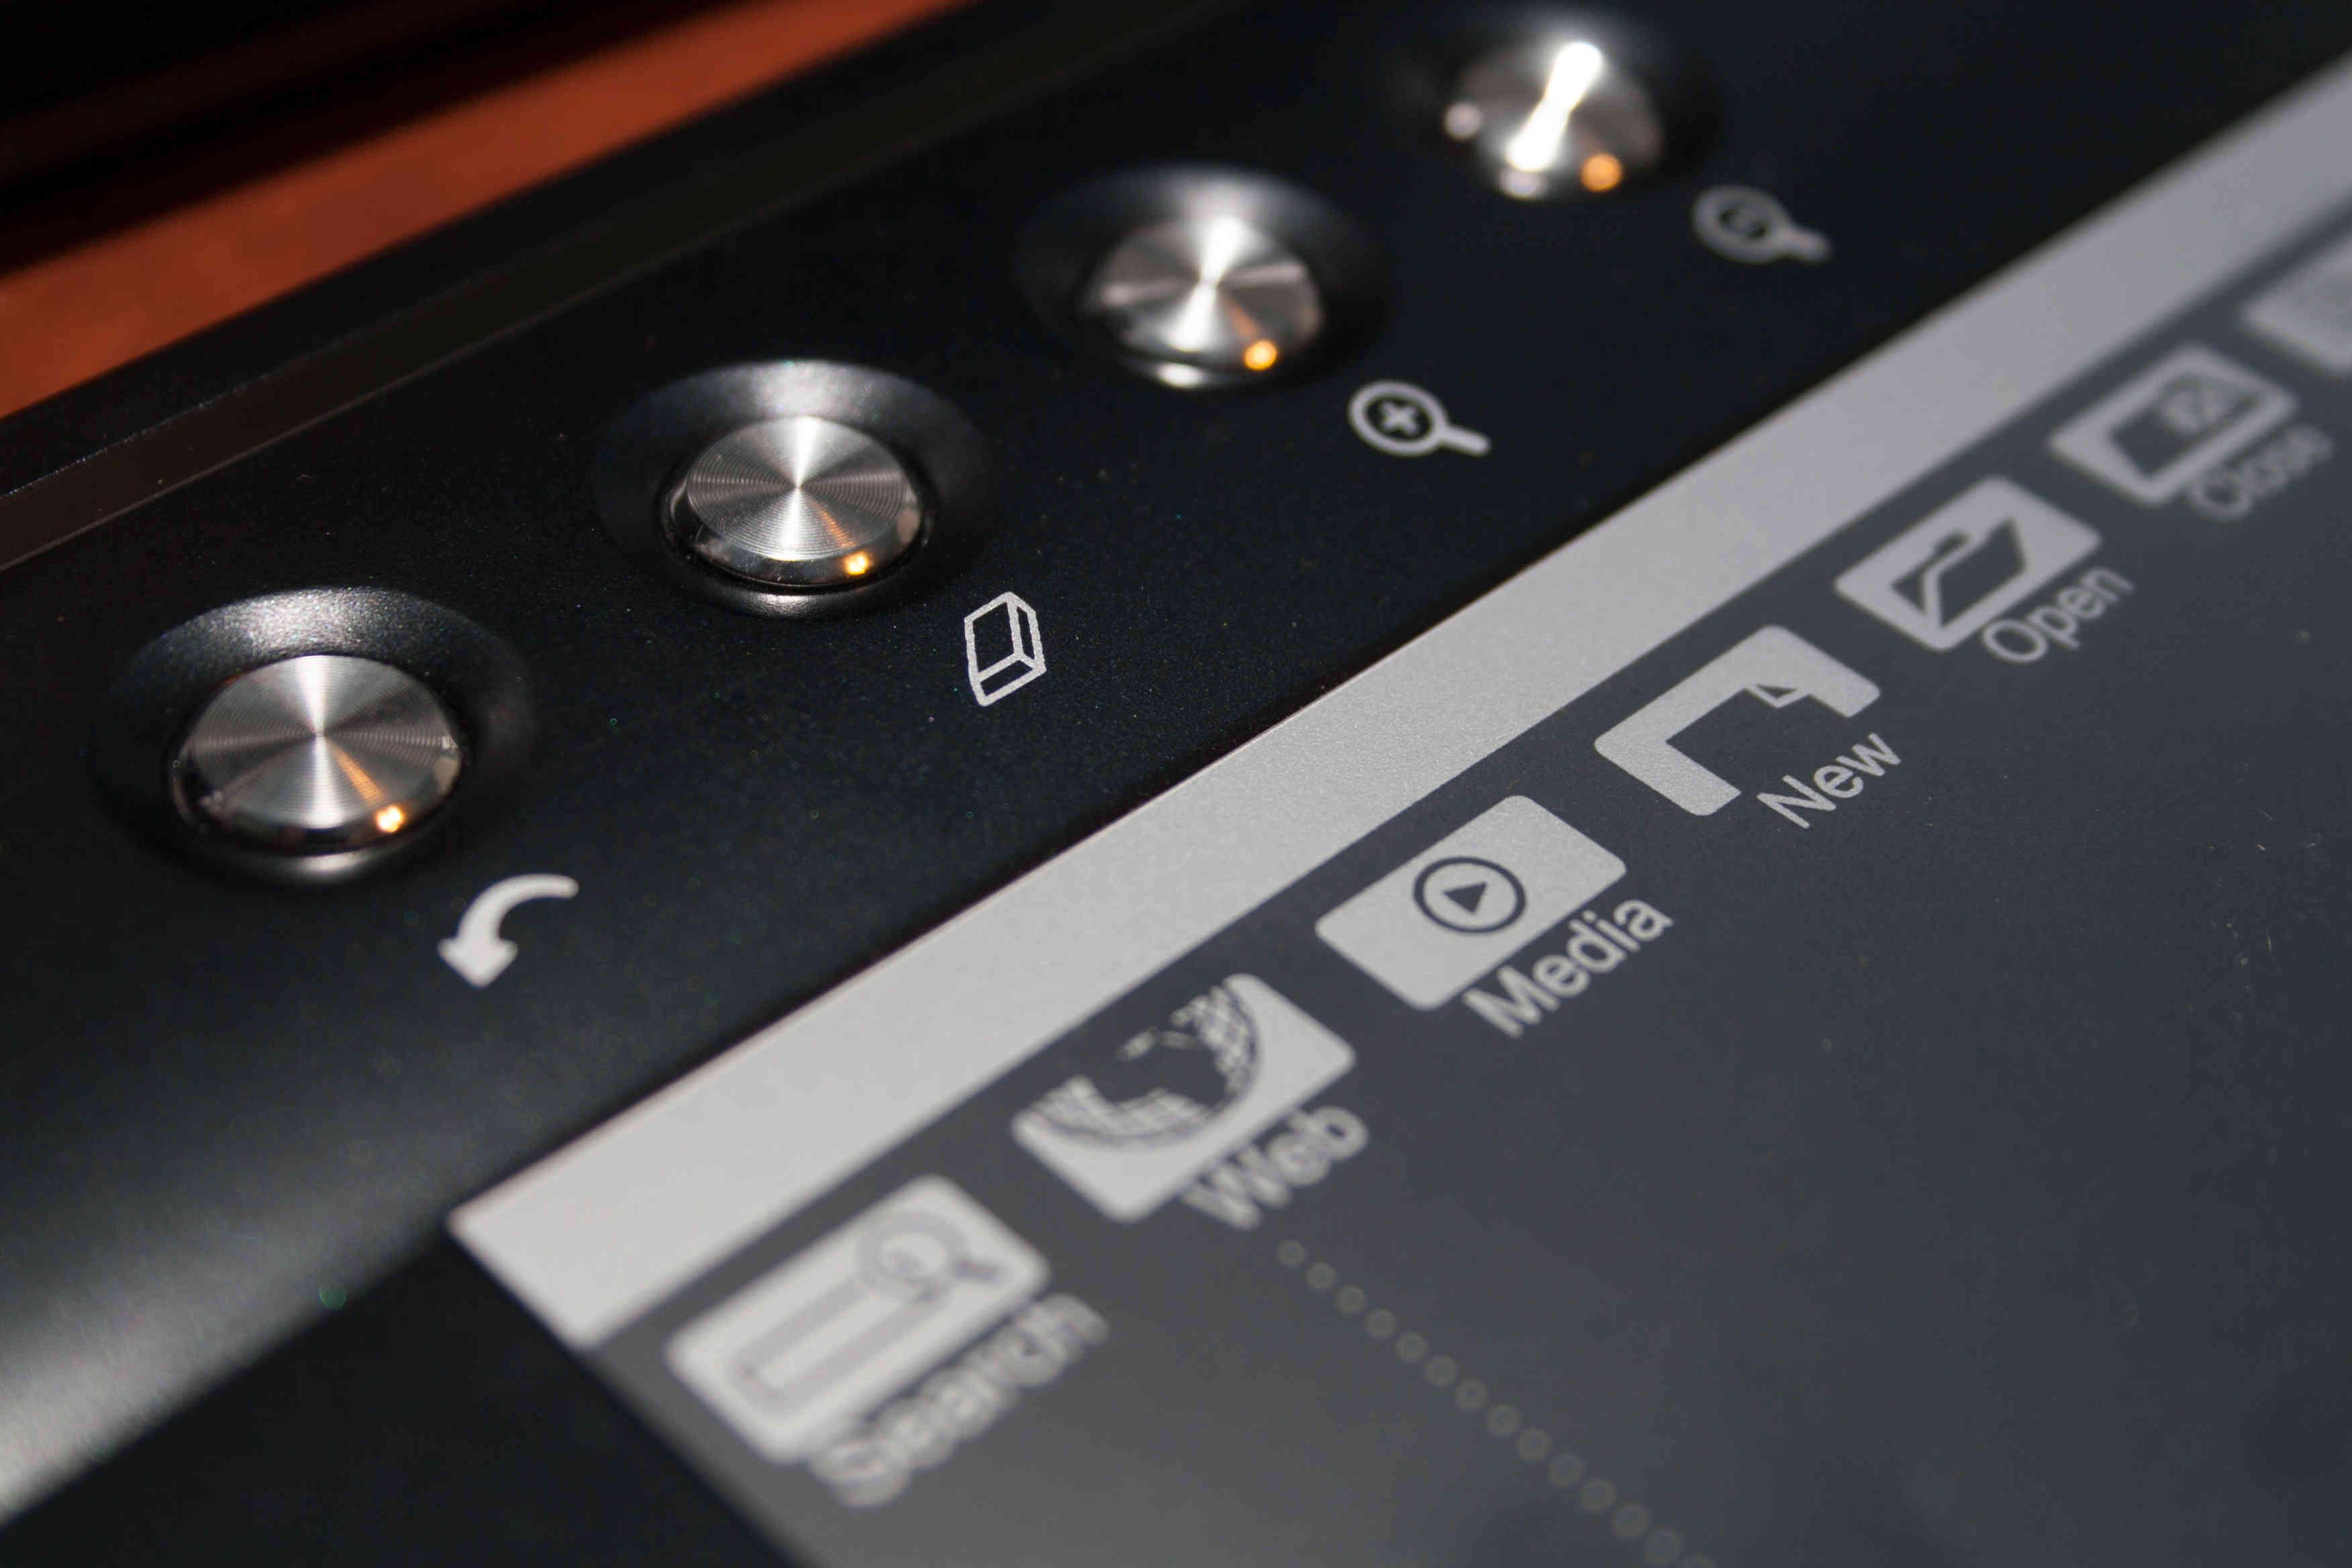 GENIUS EASYPEN M610X TABLET DRIVERS DOWNLOAD FREE